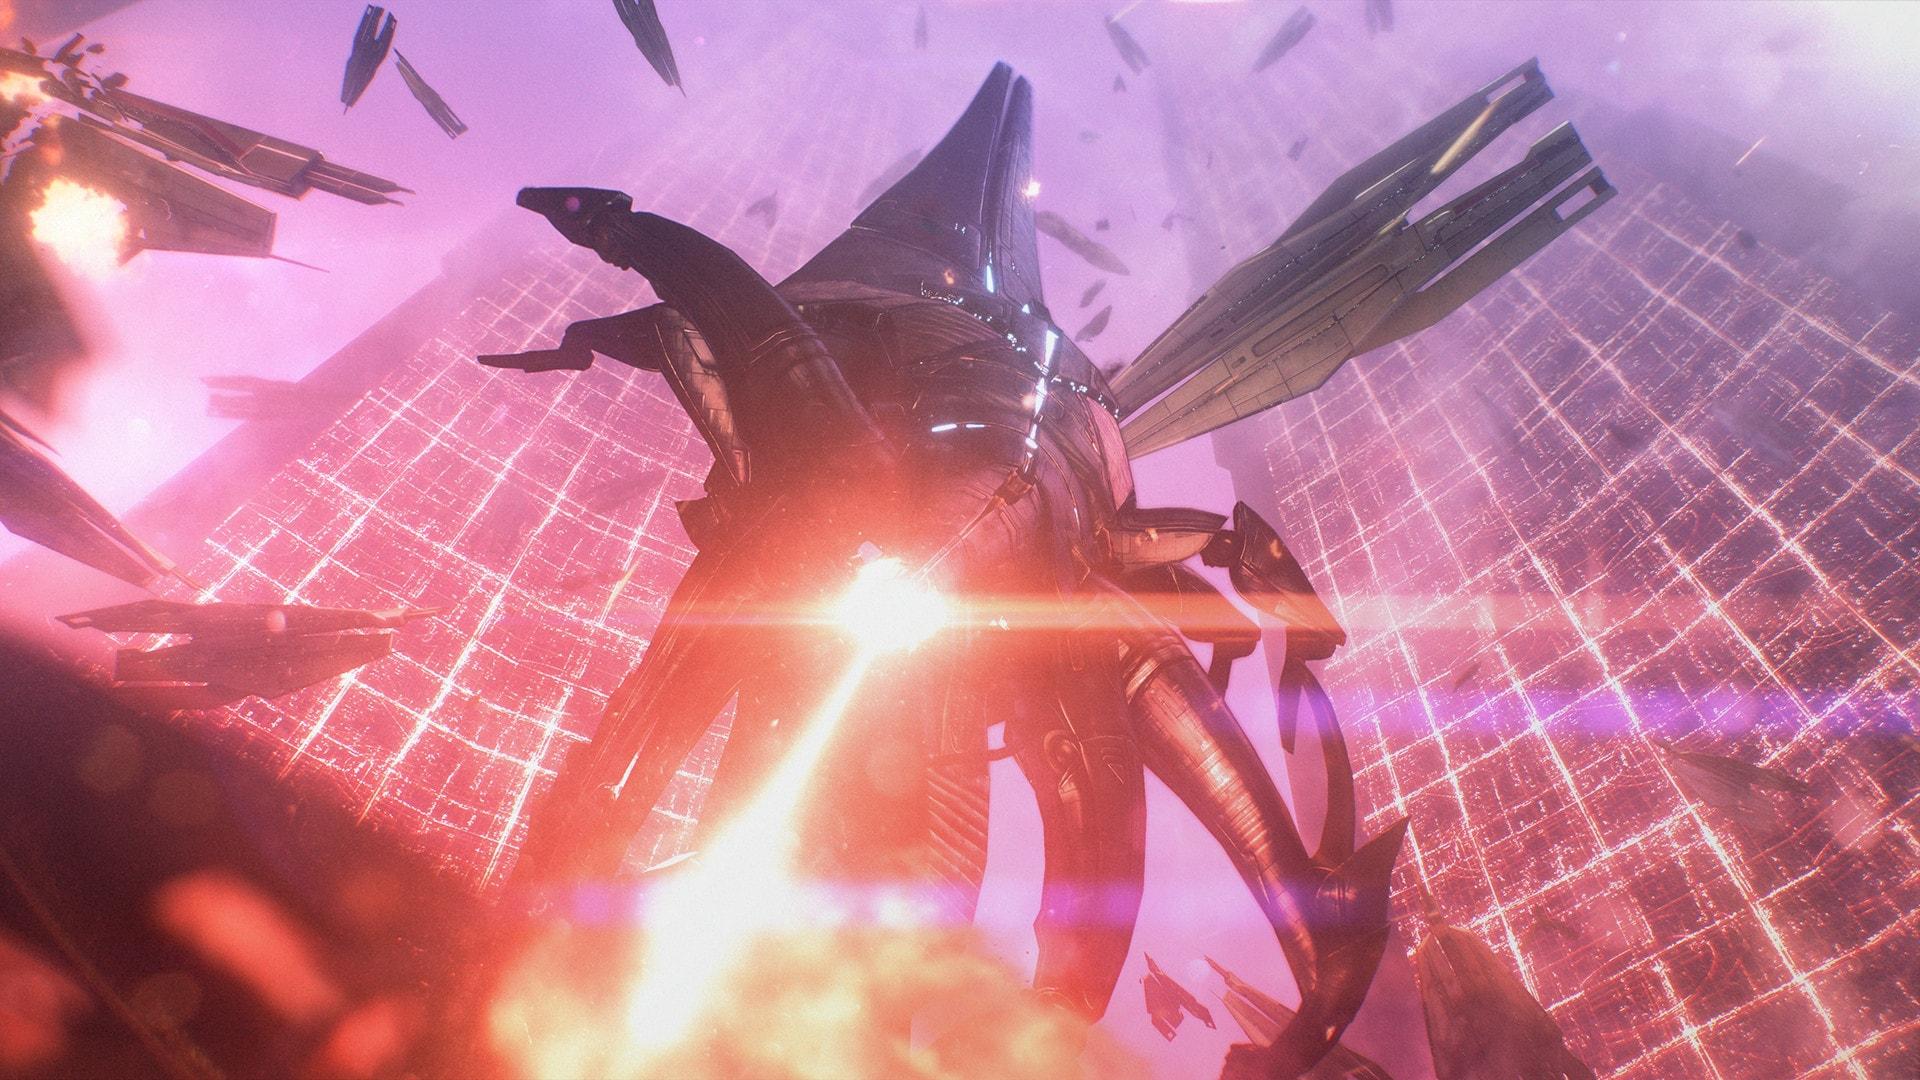 Mass Effect Legendary Edition (PC) - Origin Key - GLOBAL (EN/PL/RU) - 2